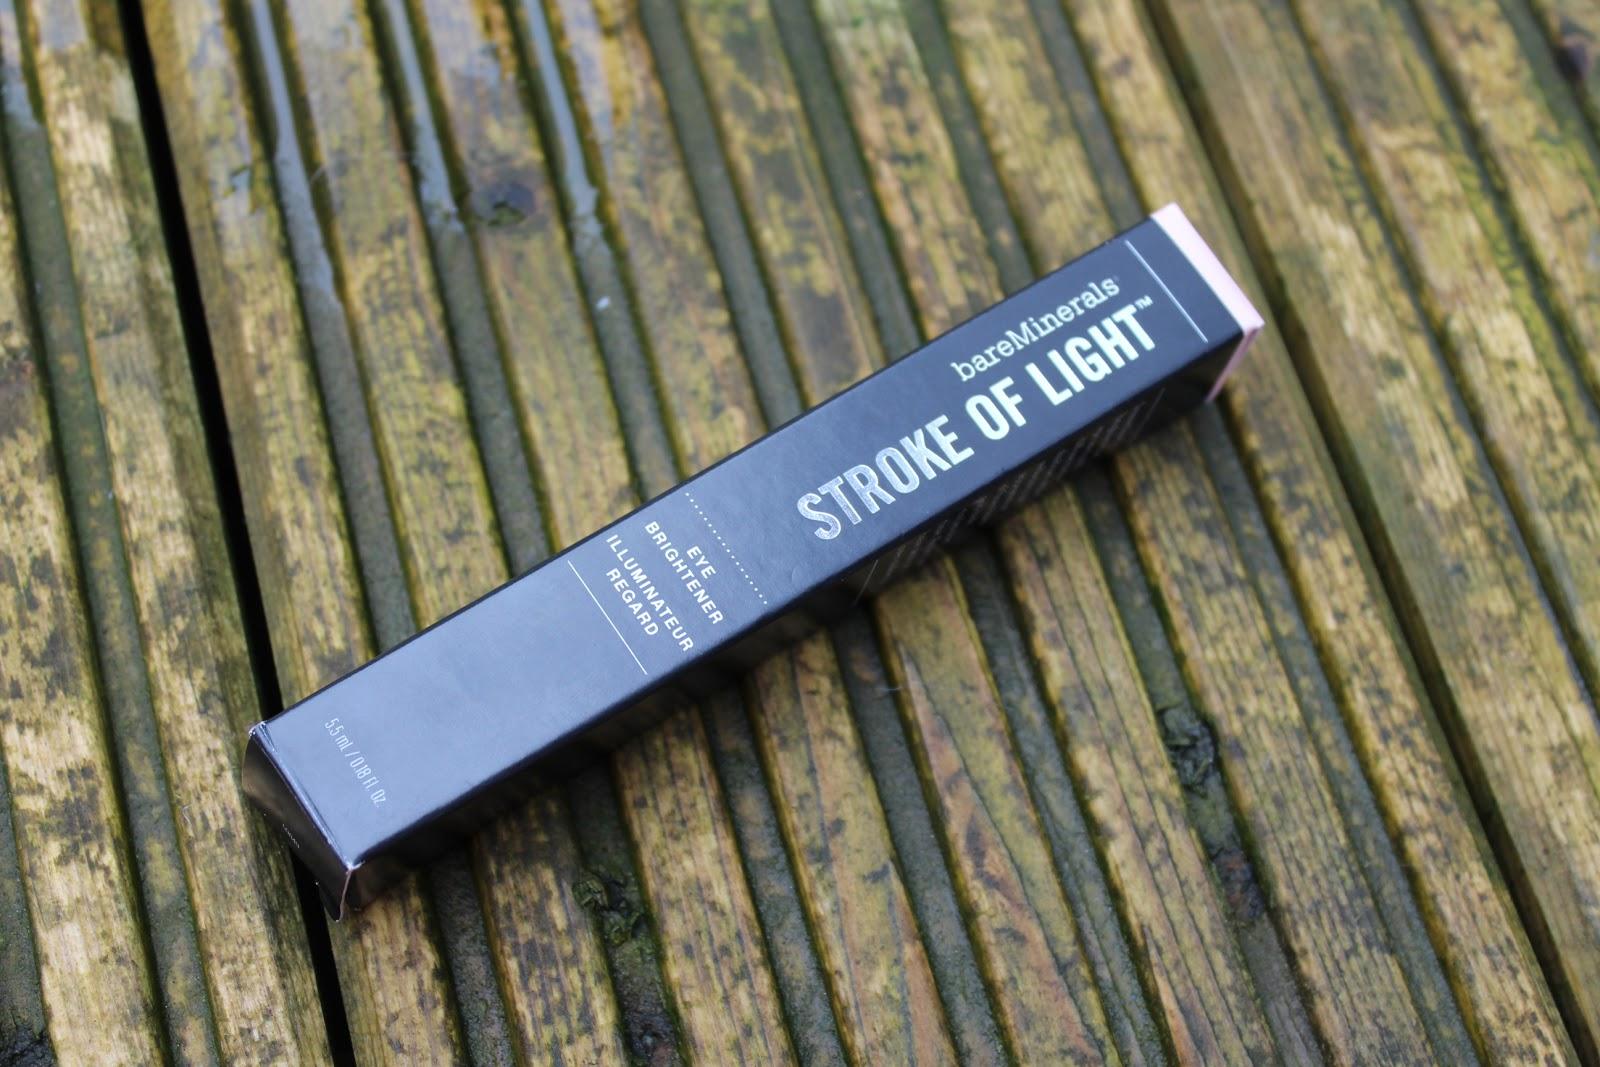 bare minerals stroke of light eye brightener review. Black Bedroom Furniture Sets. Home Design Ideas